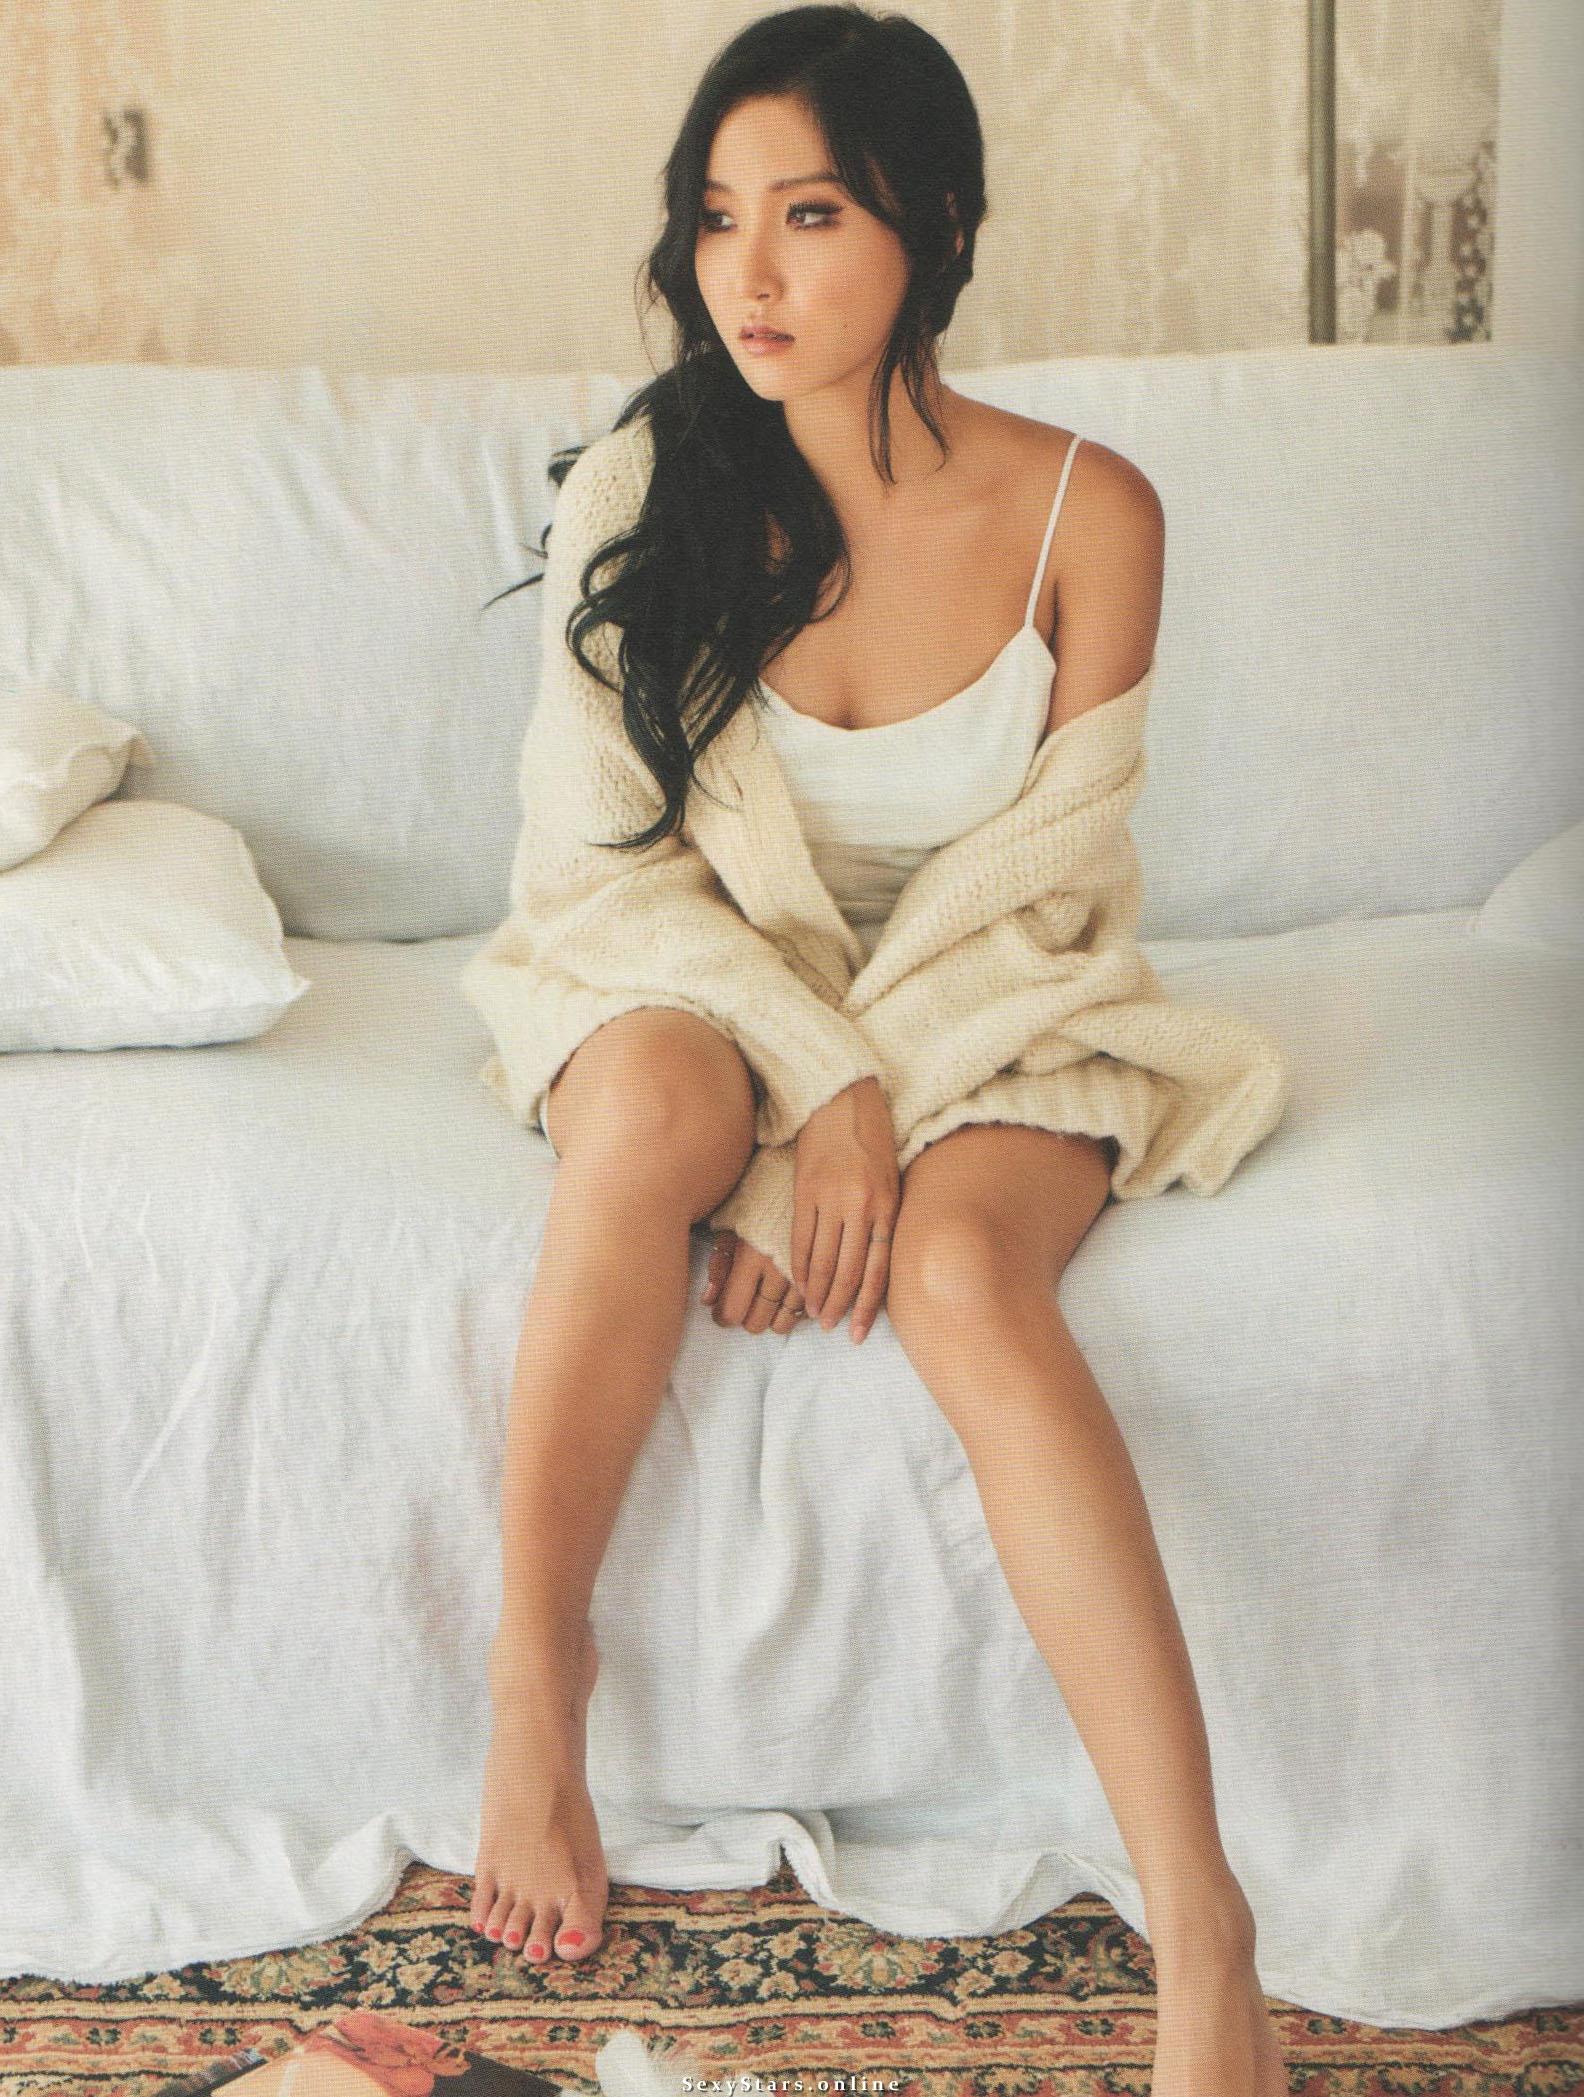 Хан Хе Джин голая. Фото - 4